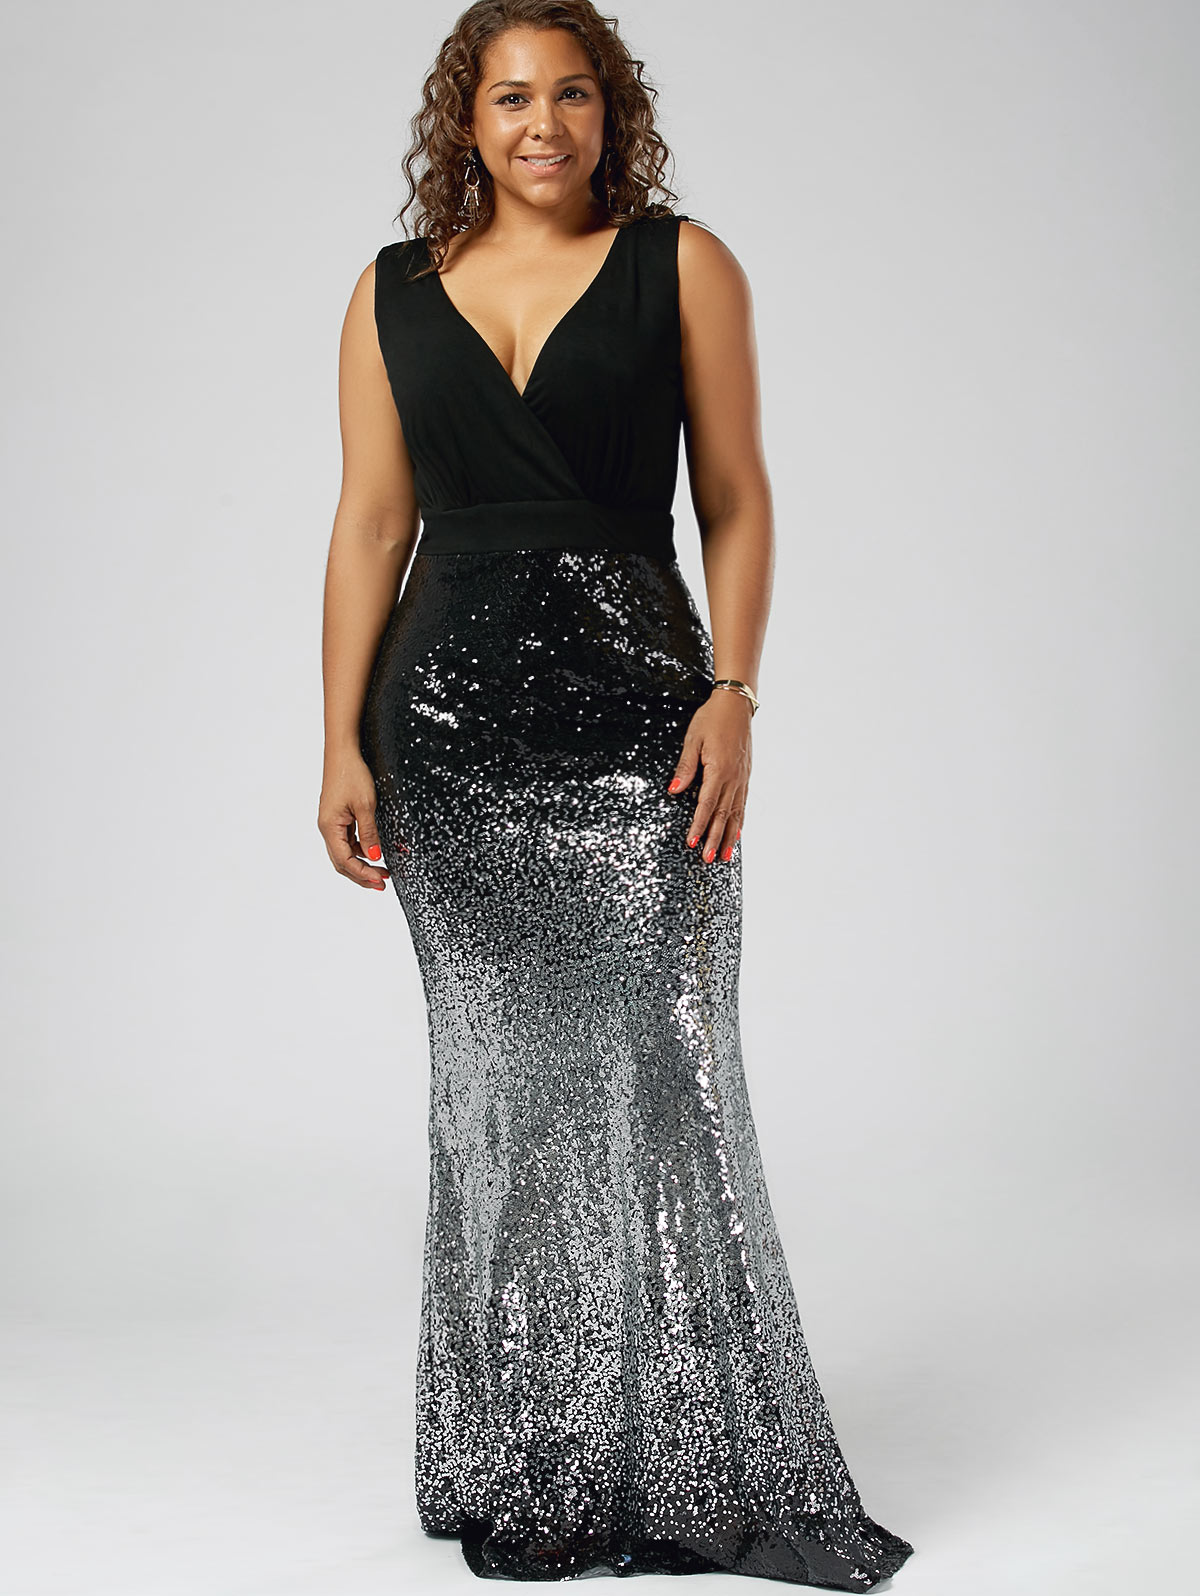 e3fac1b85dd8b Kenancy Plus Size Fashion Sequins Party Dress Sexy V Neck Sleeveless High  Waist Maxi Fishtail Dress Club Vestidos De Festa Robe